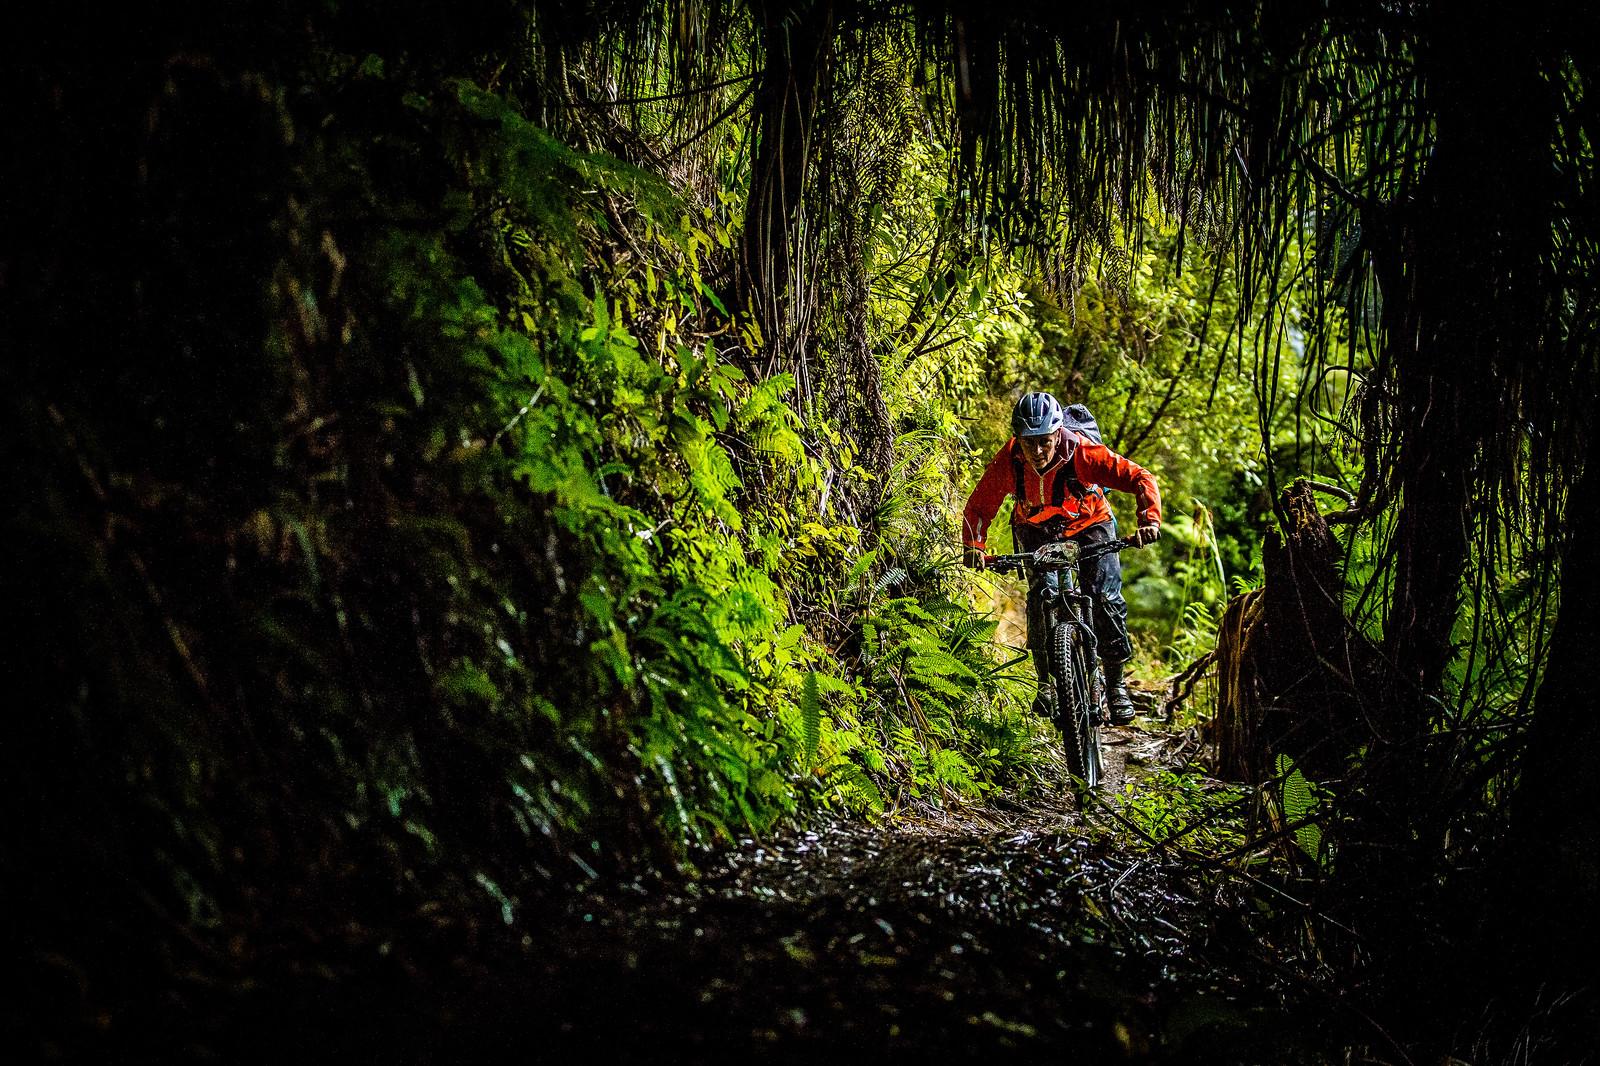 Anka Martin, NZ Enduro Organizer - NZ Enduro Day 2 - Mountain Biking Pictures - Vital MTB